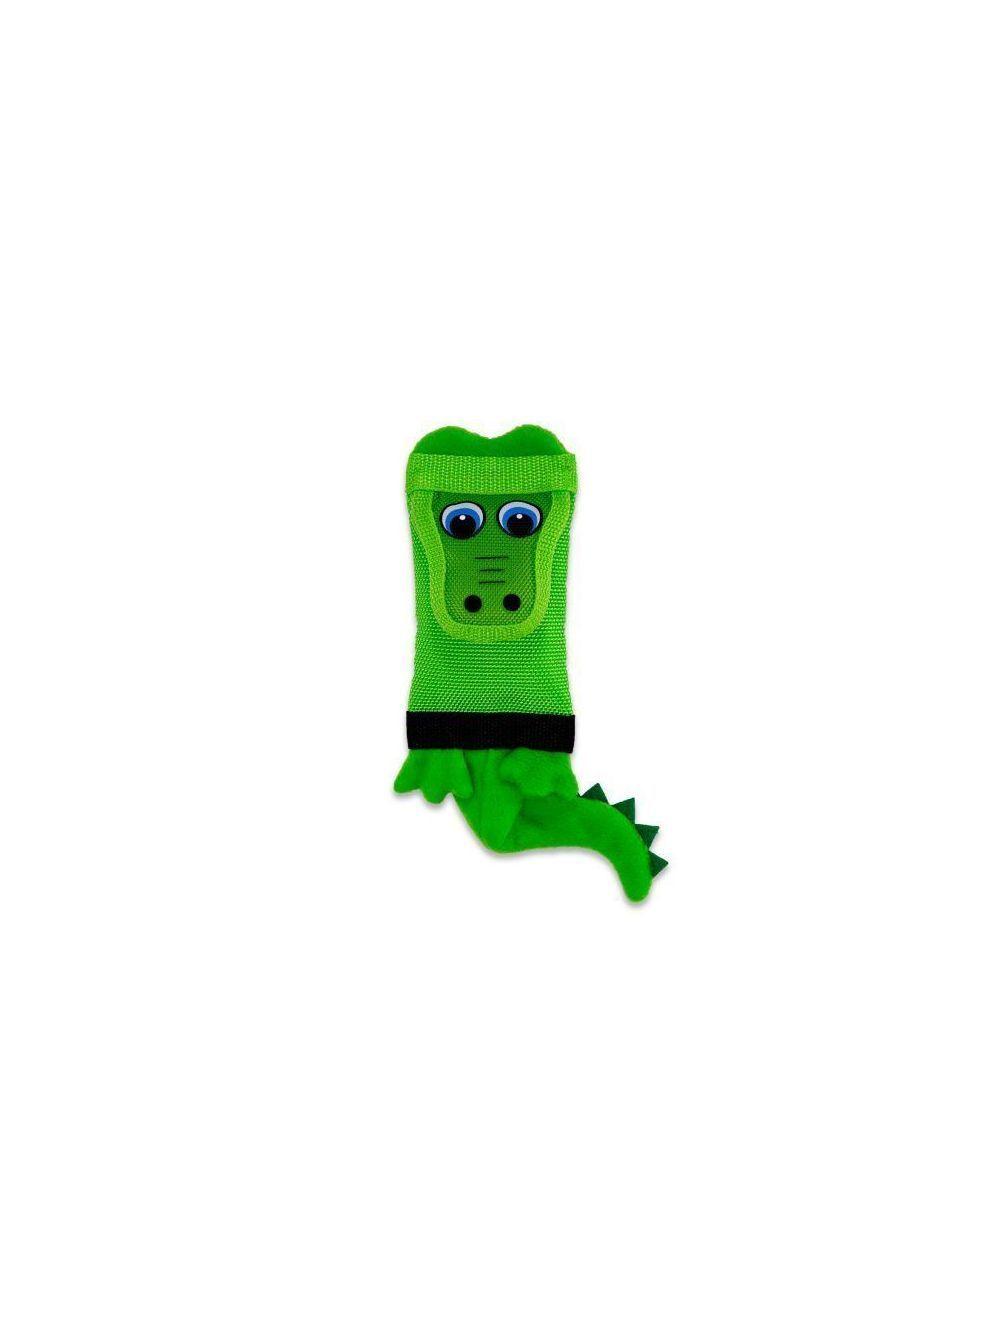 Juguete para Perros Petlogix lagarto- Ciudaddemascotas.com